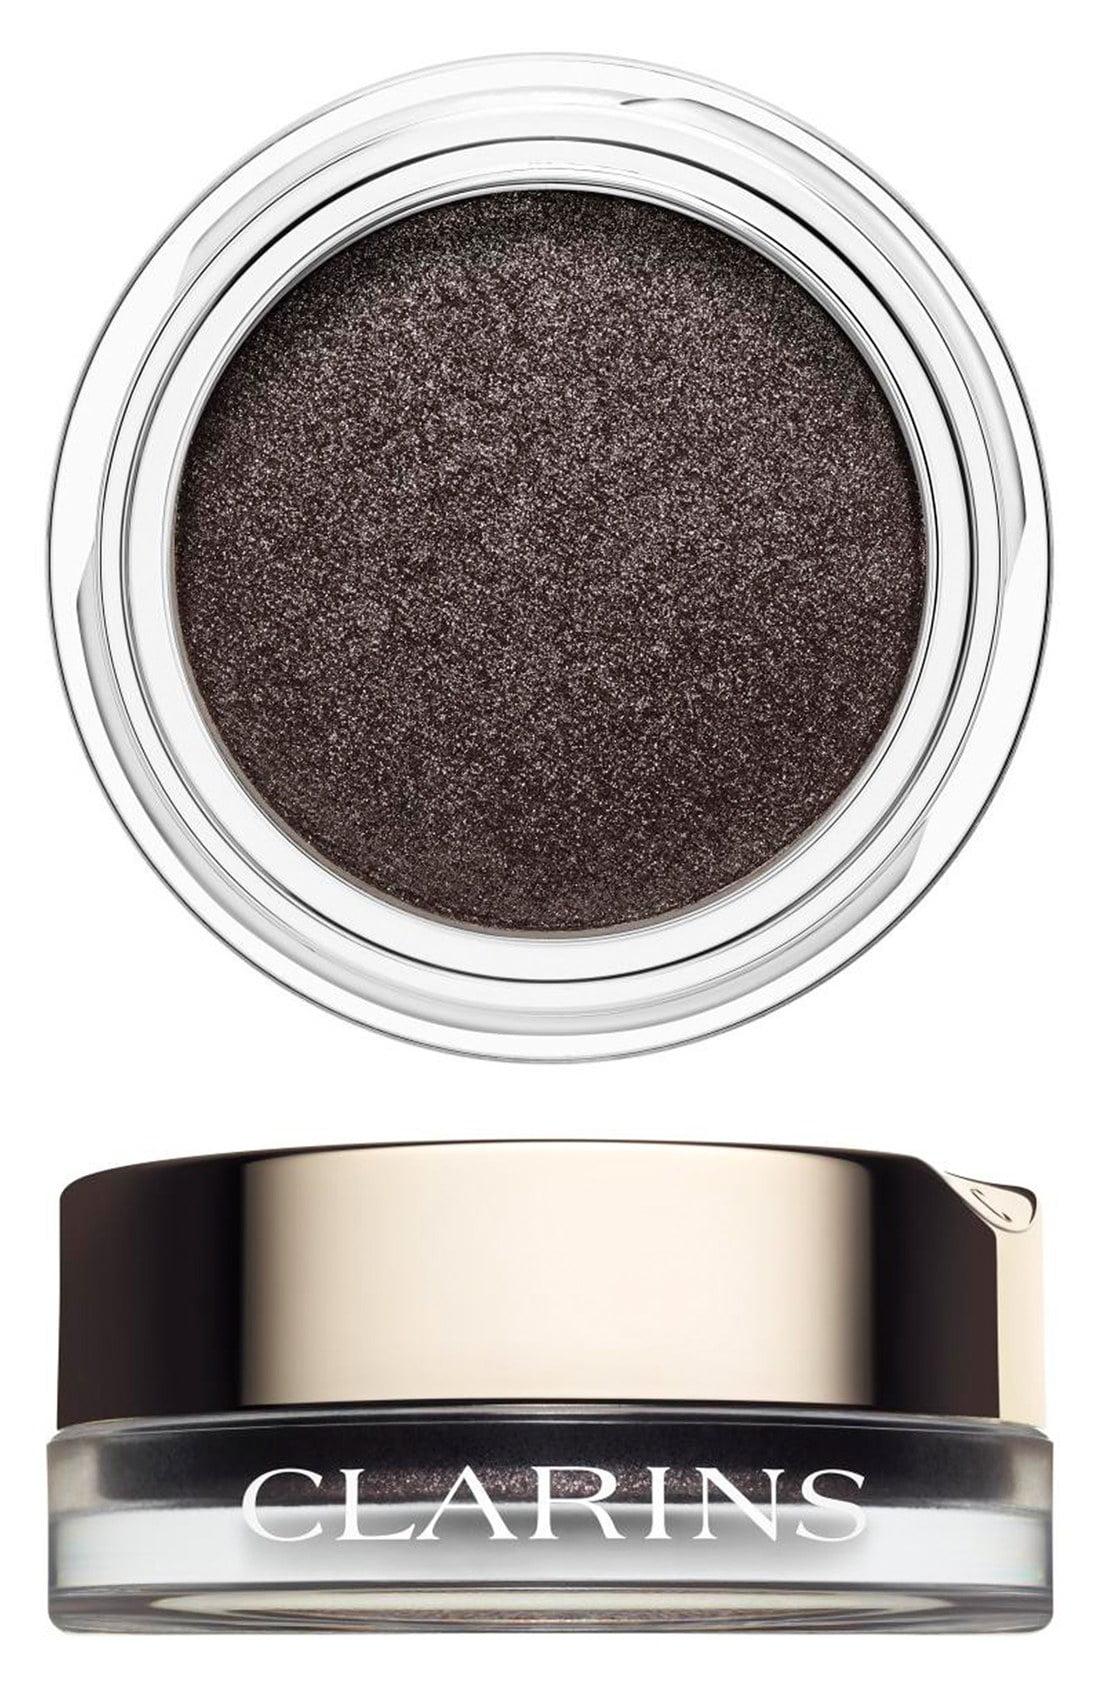 Ombre Matte Eyeshadow - 05 Sparkle Grey